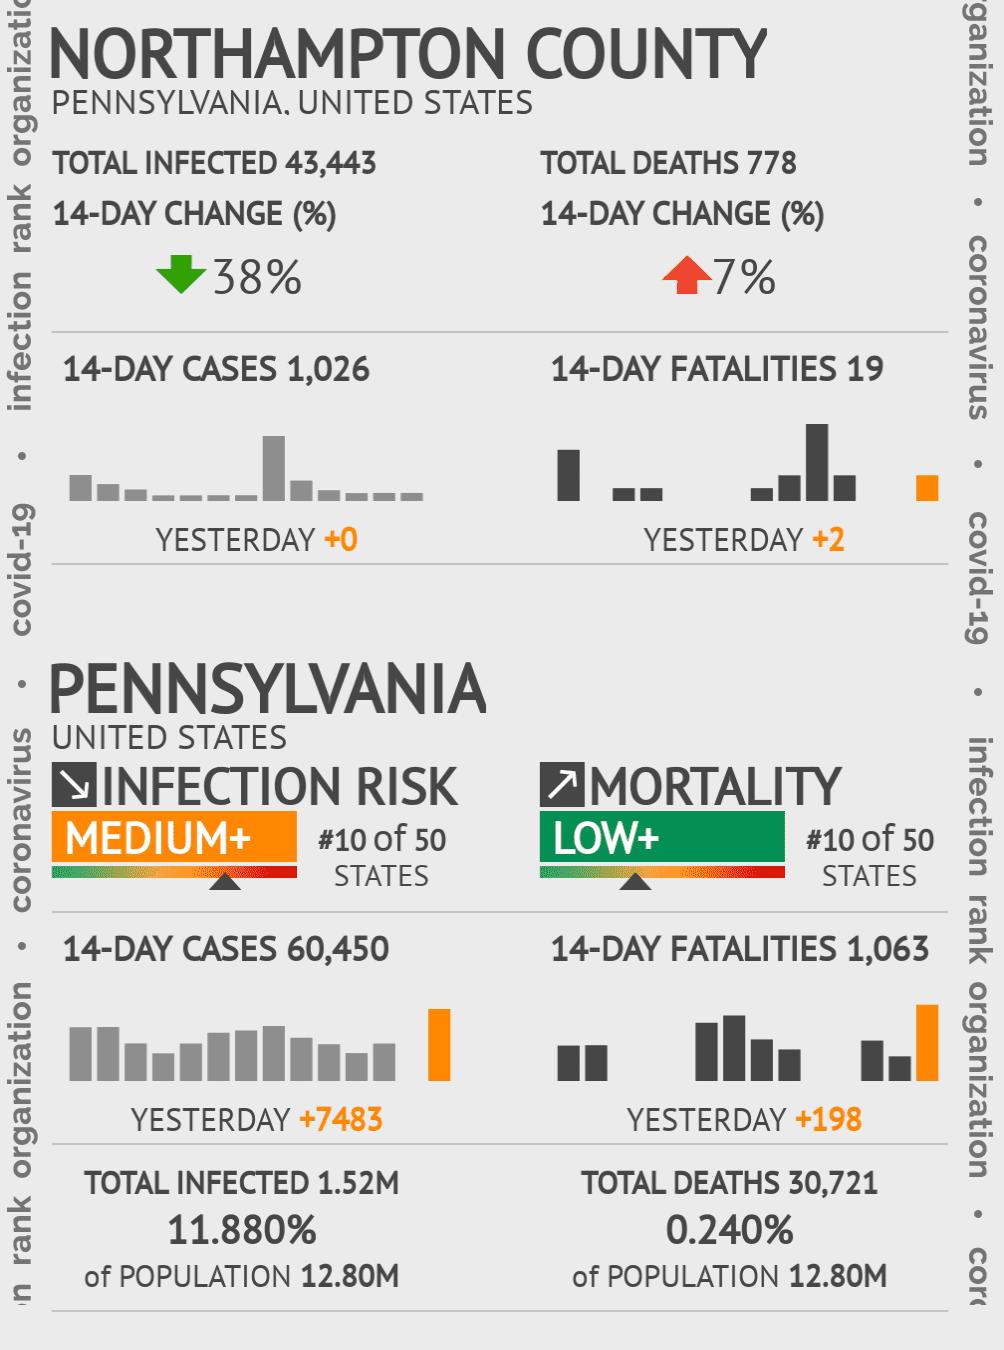 Northampton County Coronavirus Covid-19 Risk of Infection on October 16, 2020